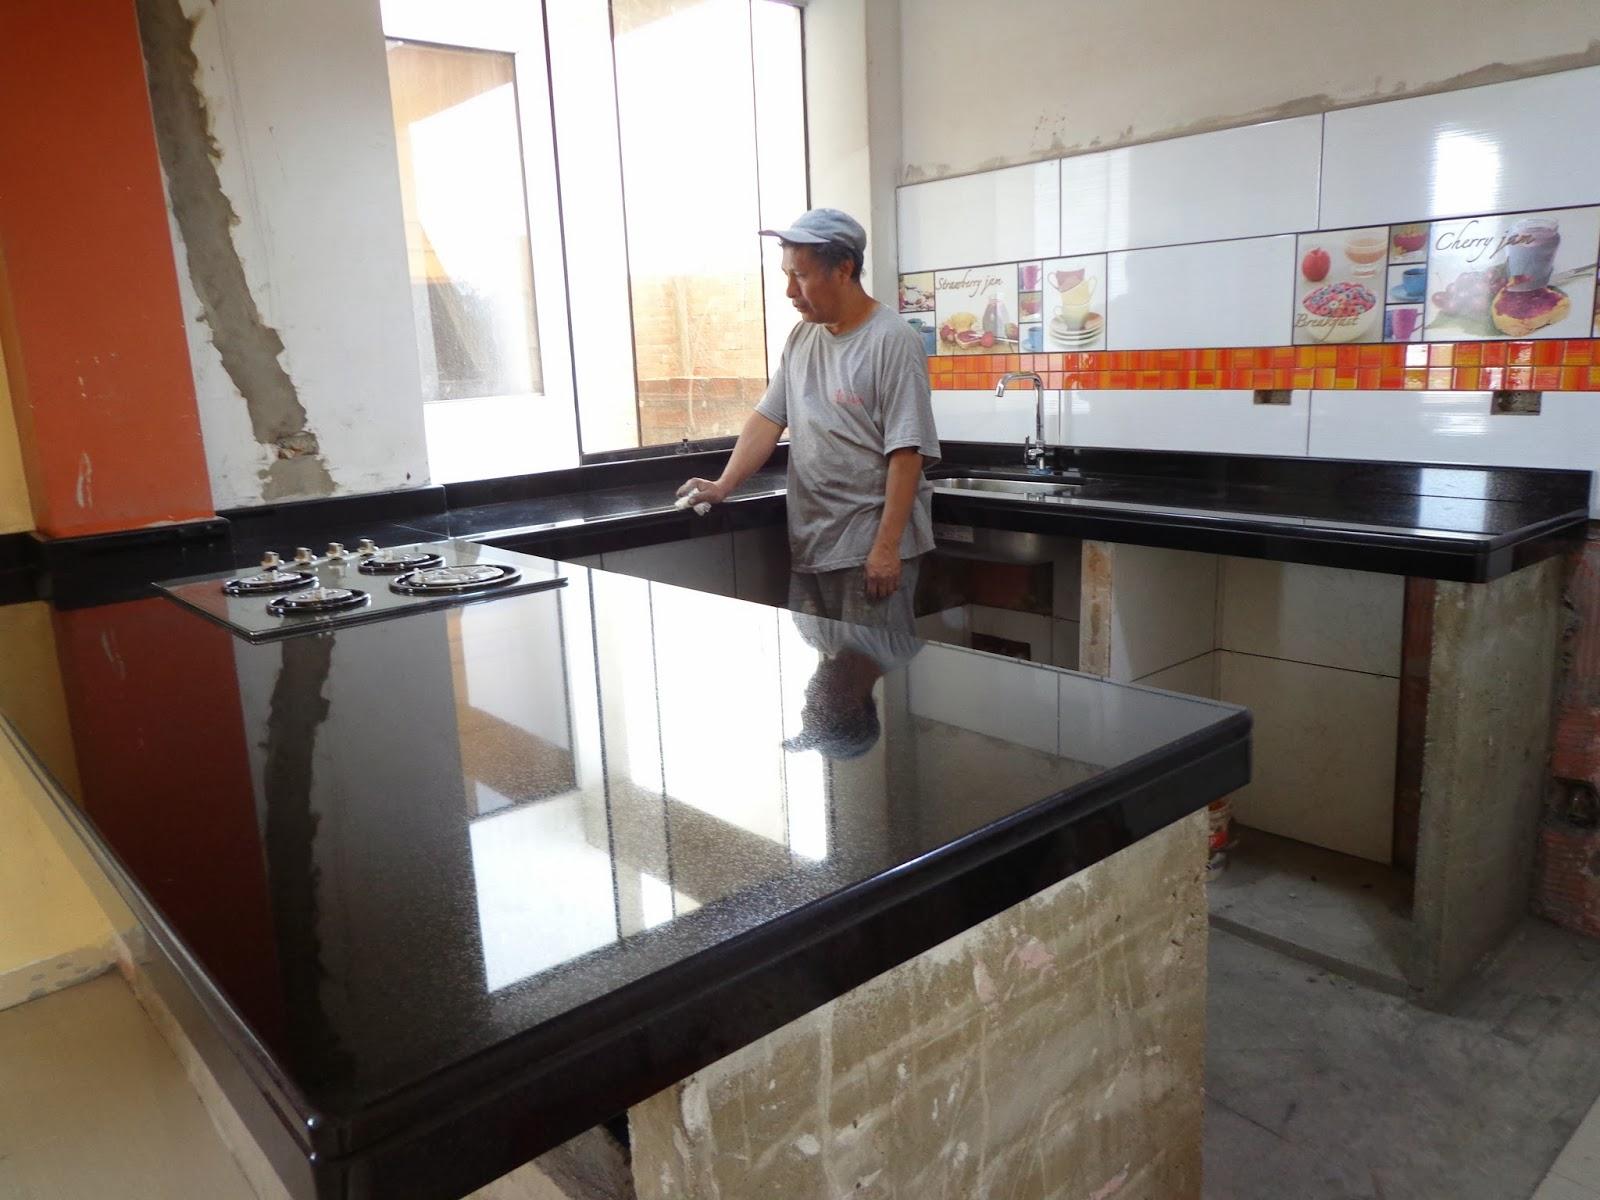 Cocinas con granito o marmol imagui for Encimera cocina marmol o granito